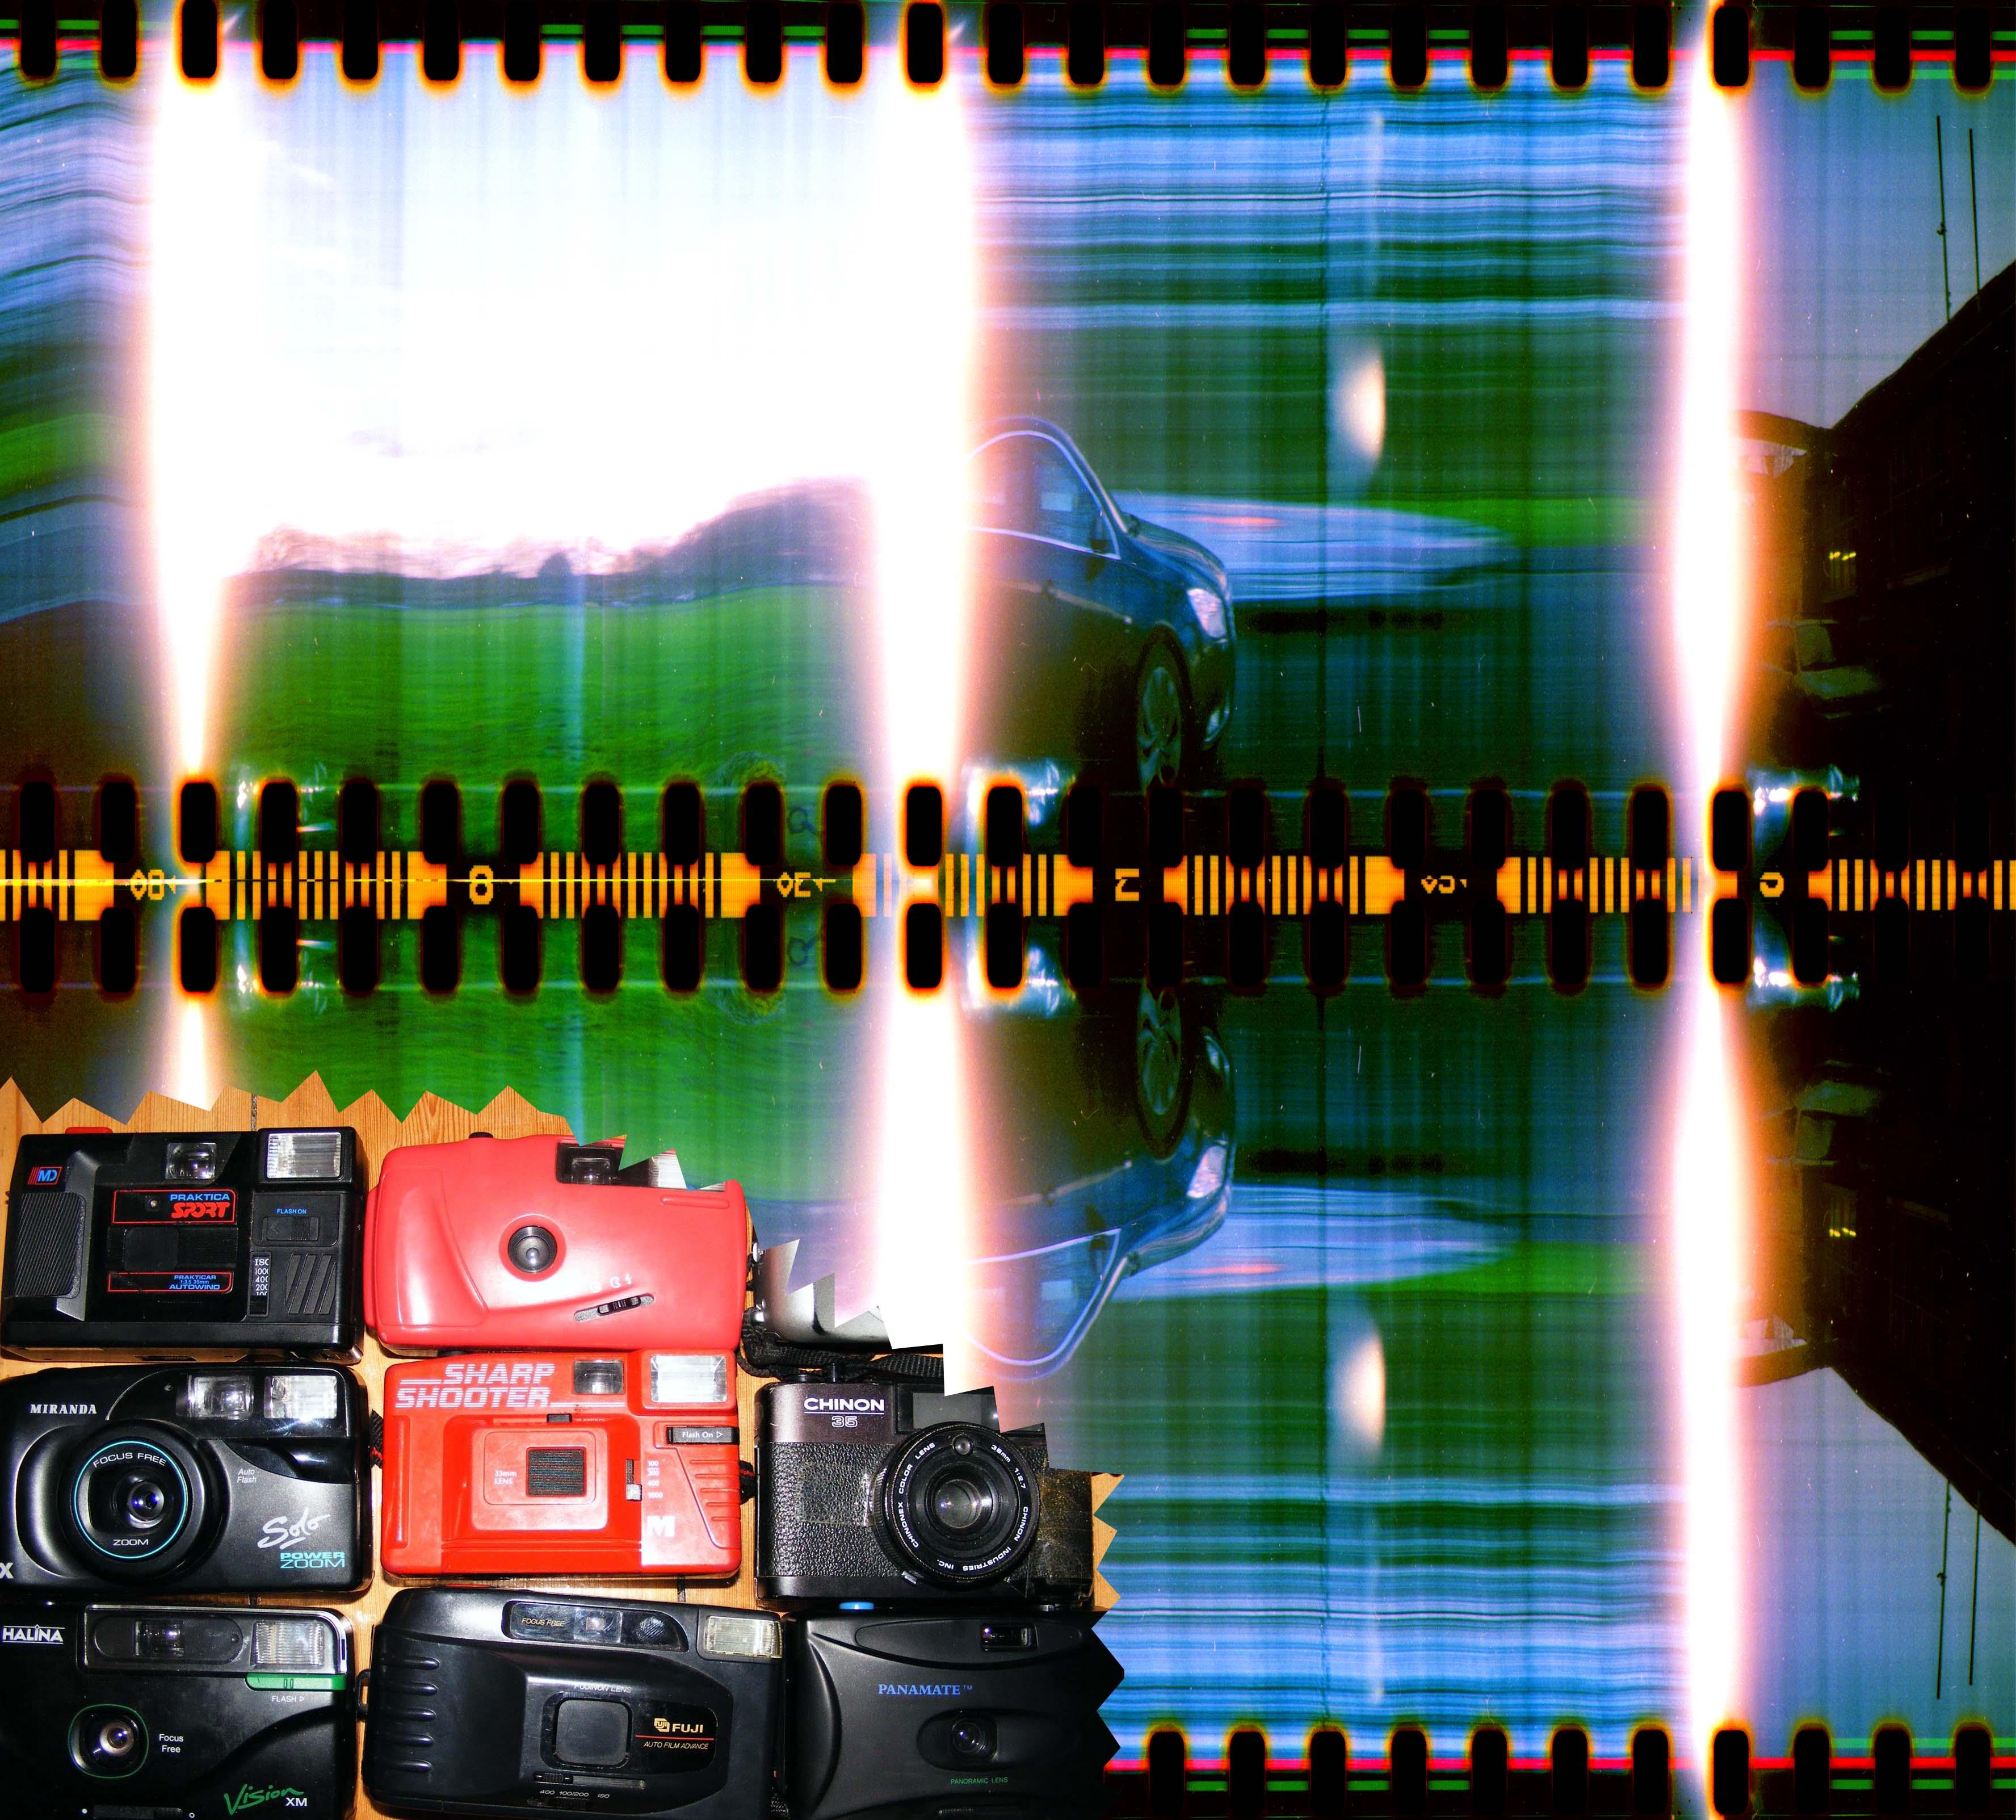 plastic camera slit scan conversion